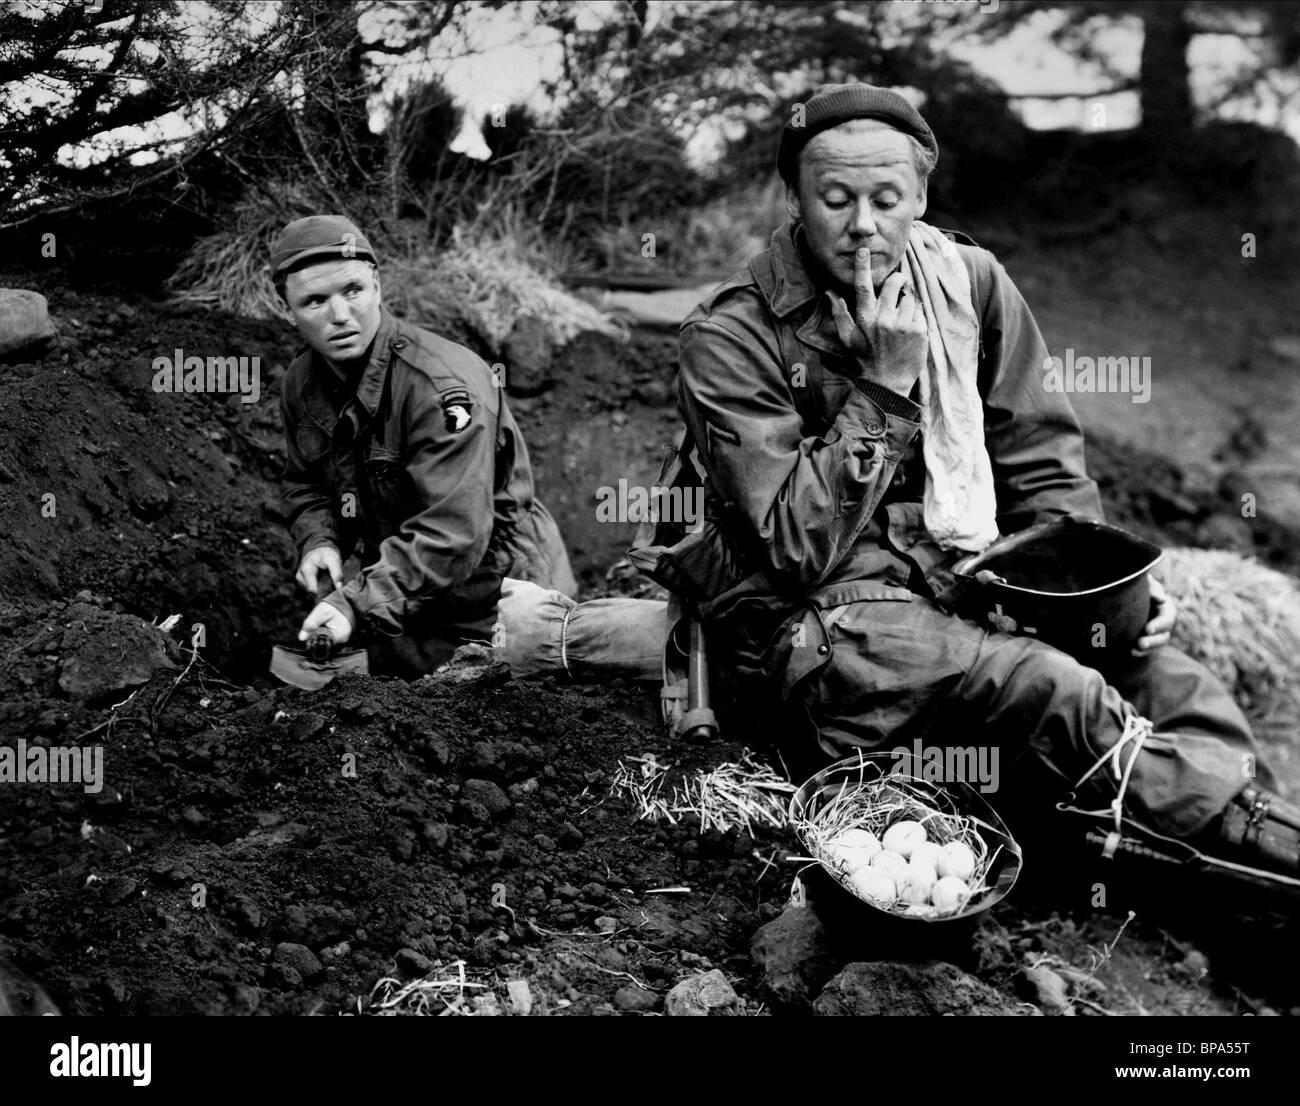 RICHARD JAECKEL & VAN JOHNSON BATTLEGROUND (1949) - Stock Image